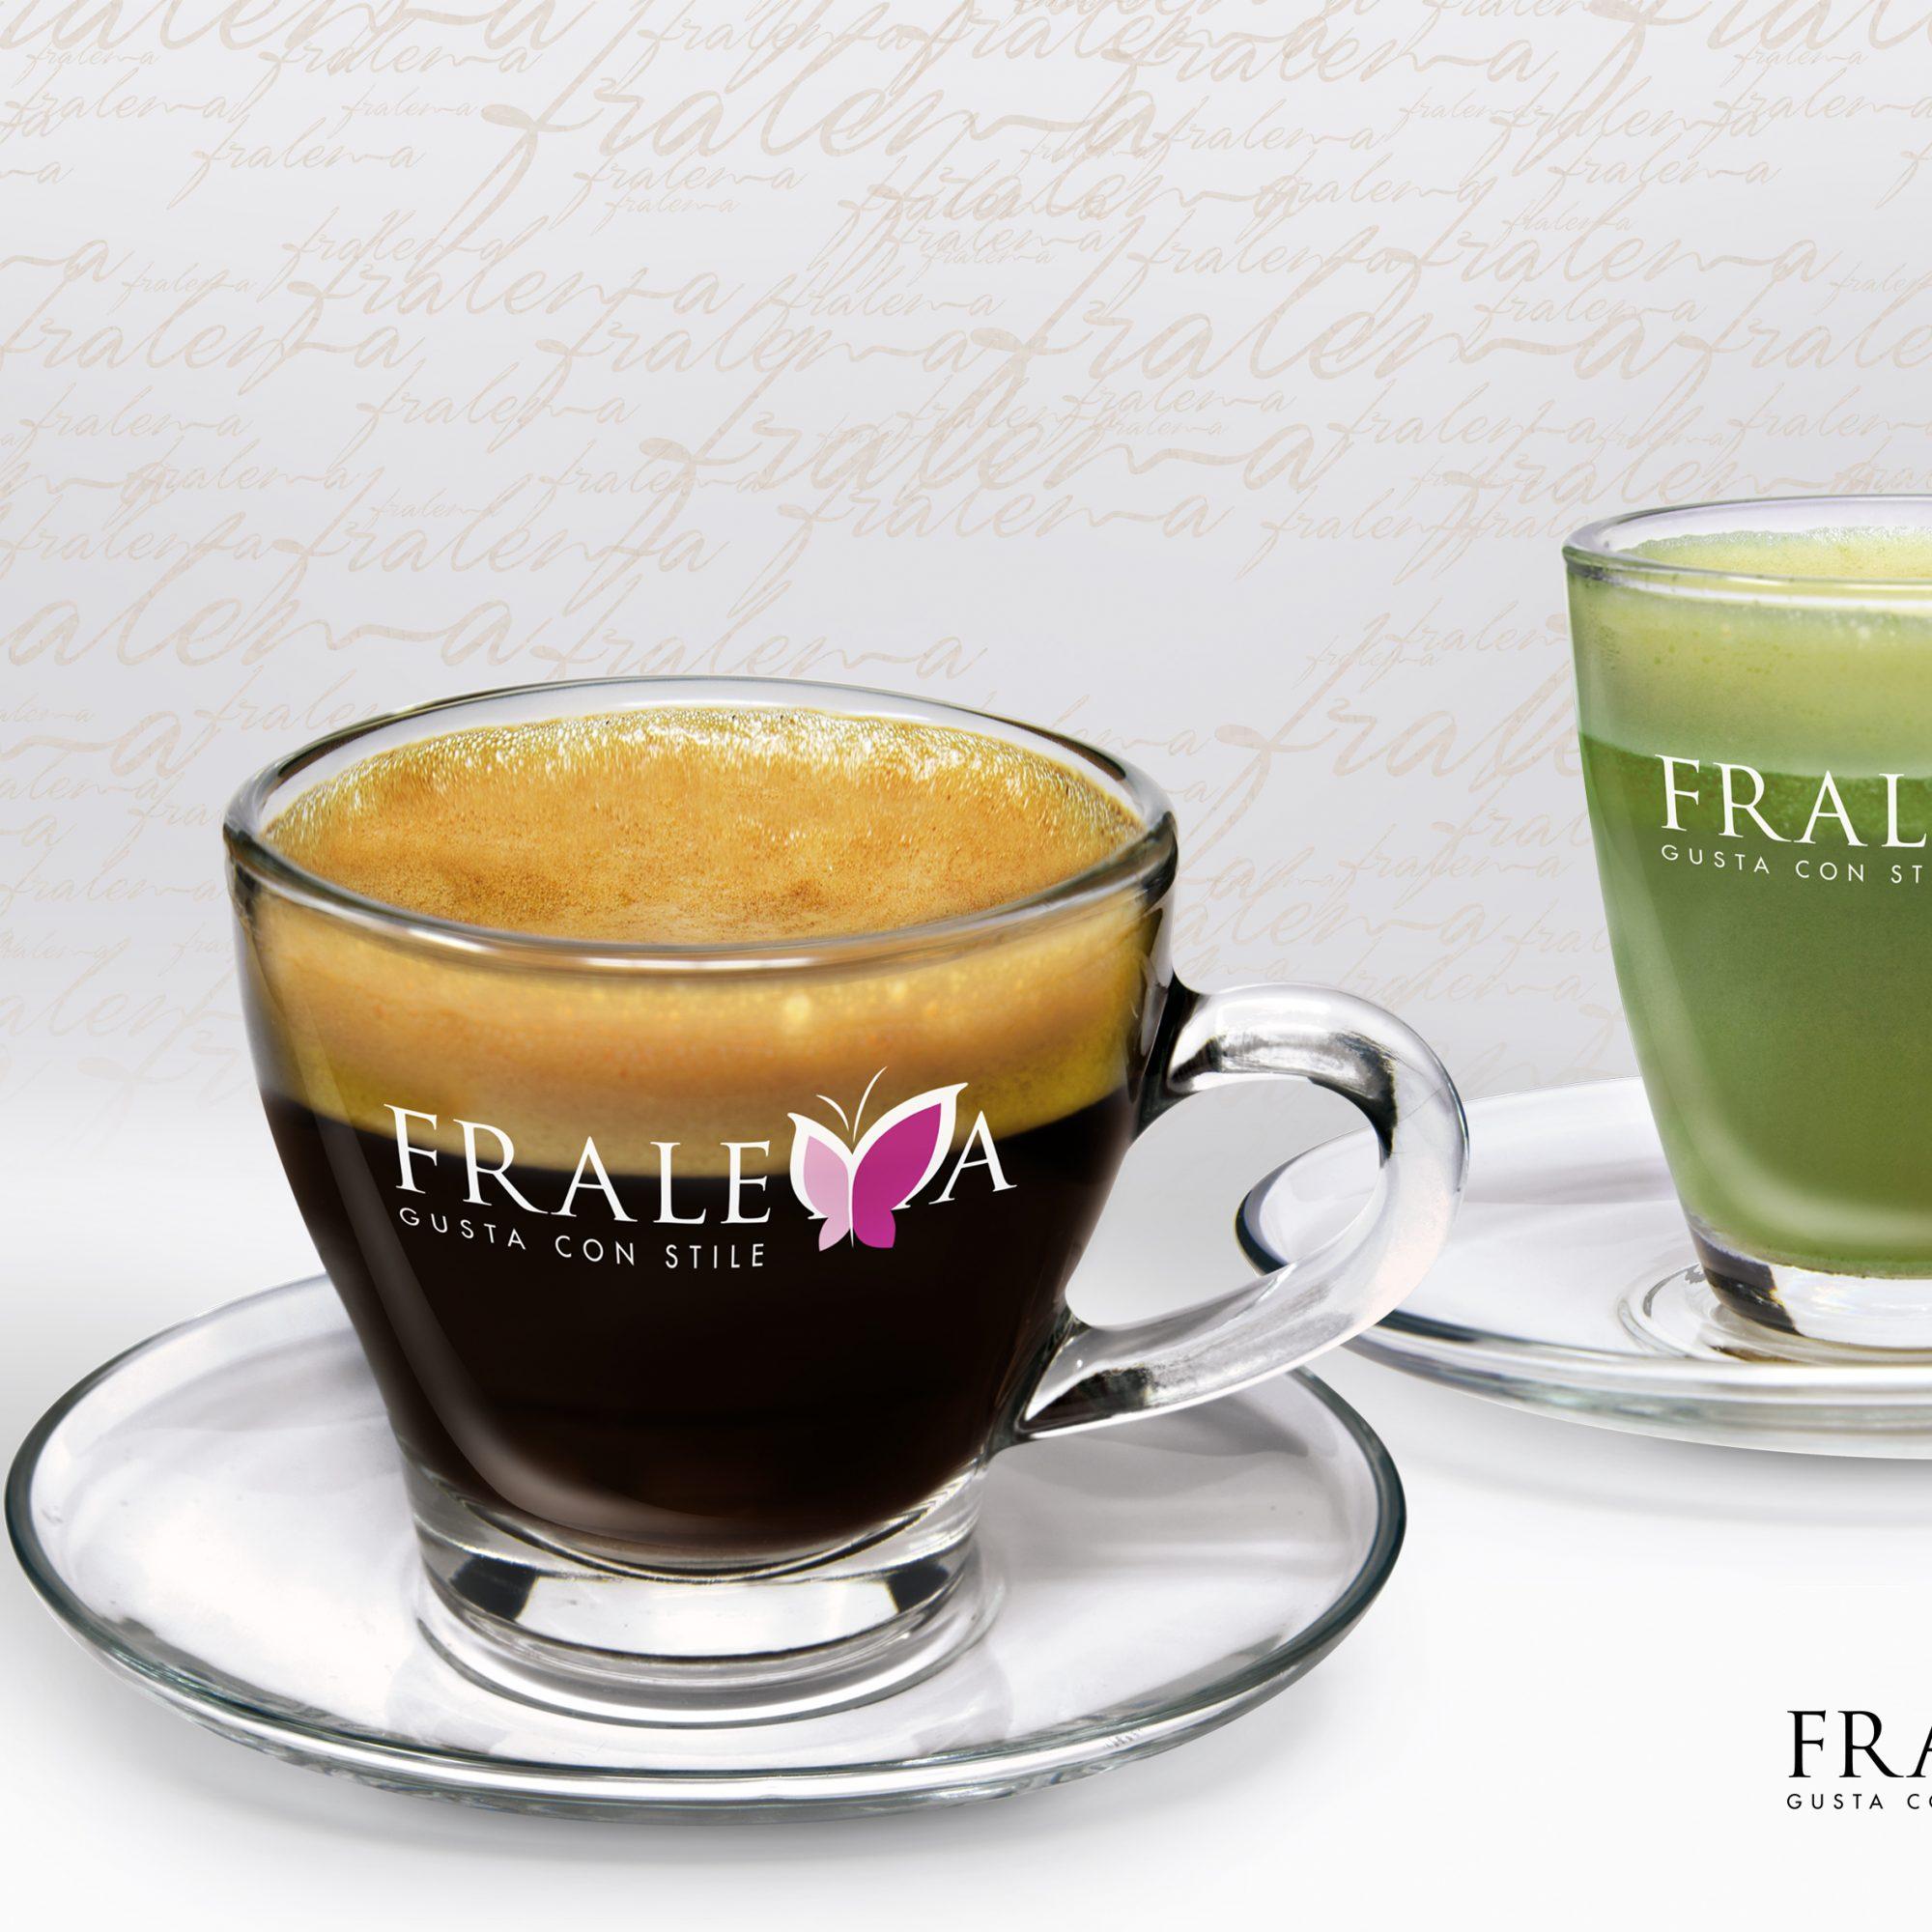 fralema_prodotti per la caffetteria_i caldi_ginseng te matcha_american coffee